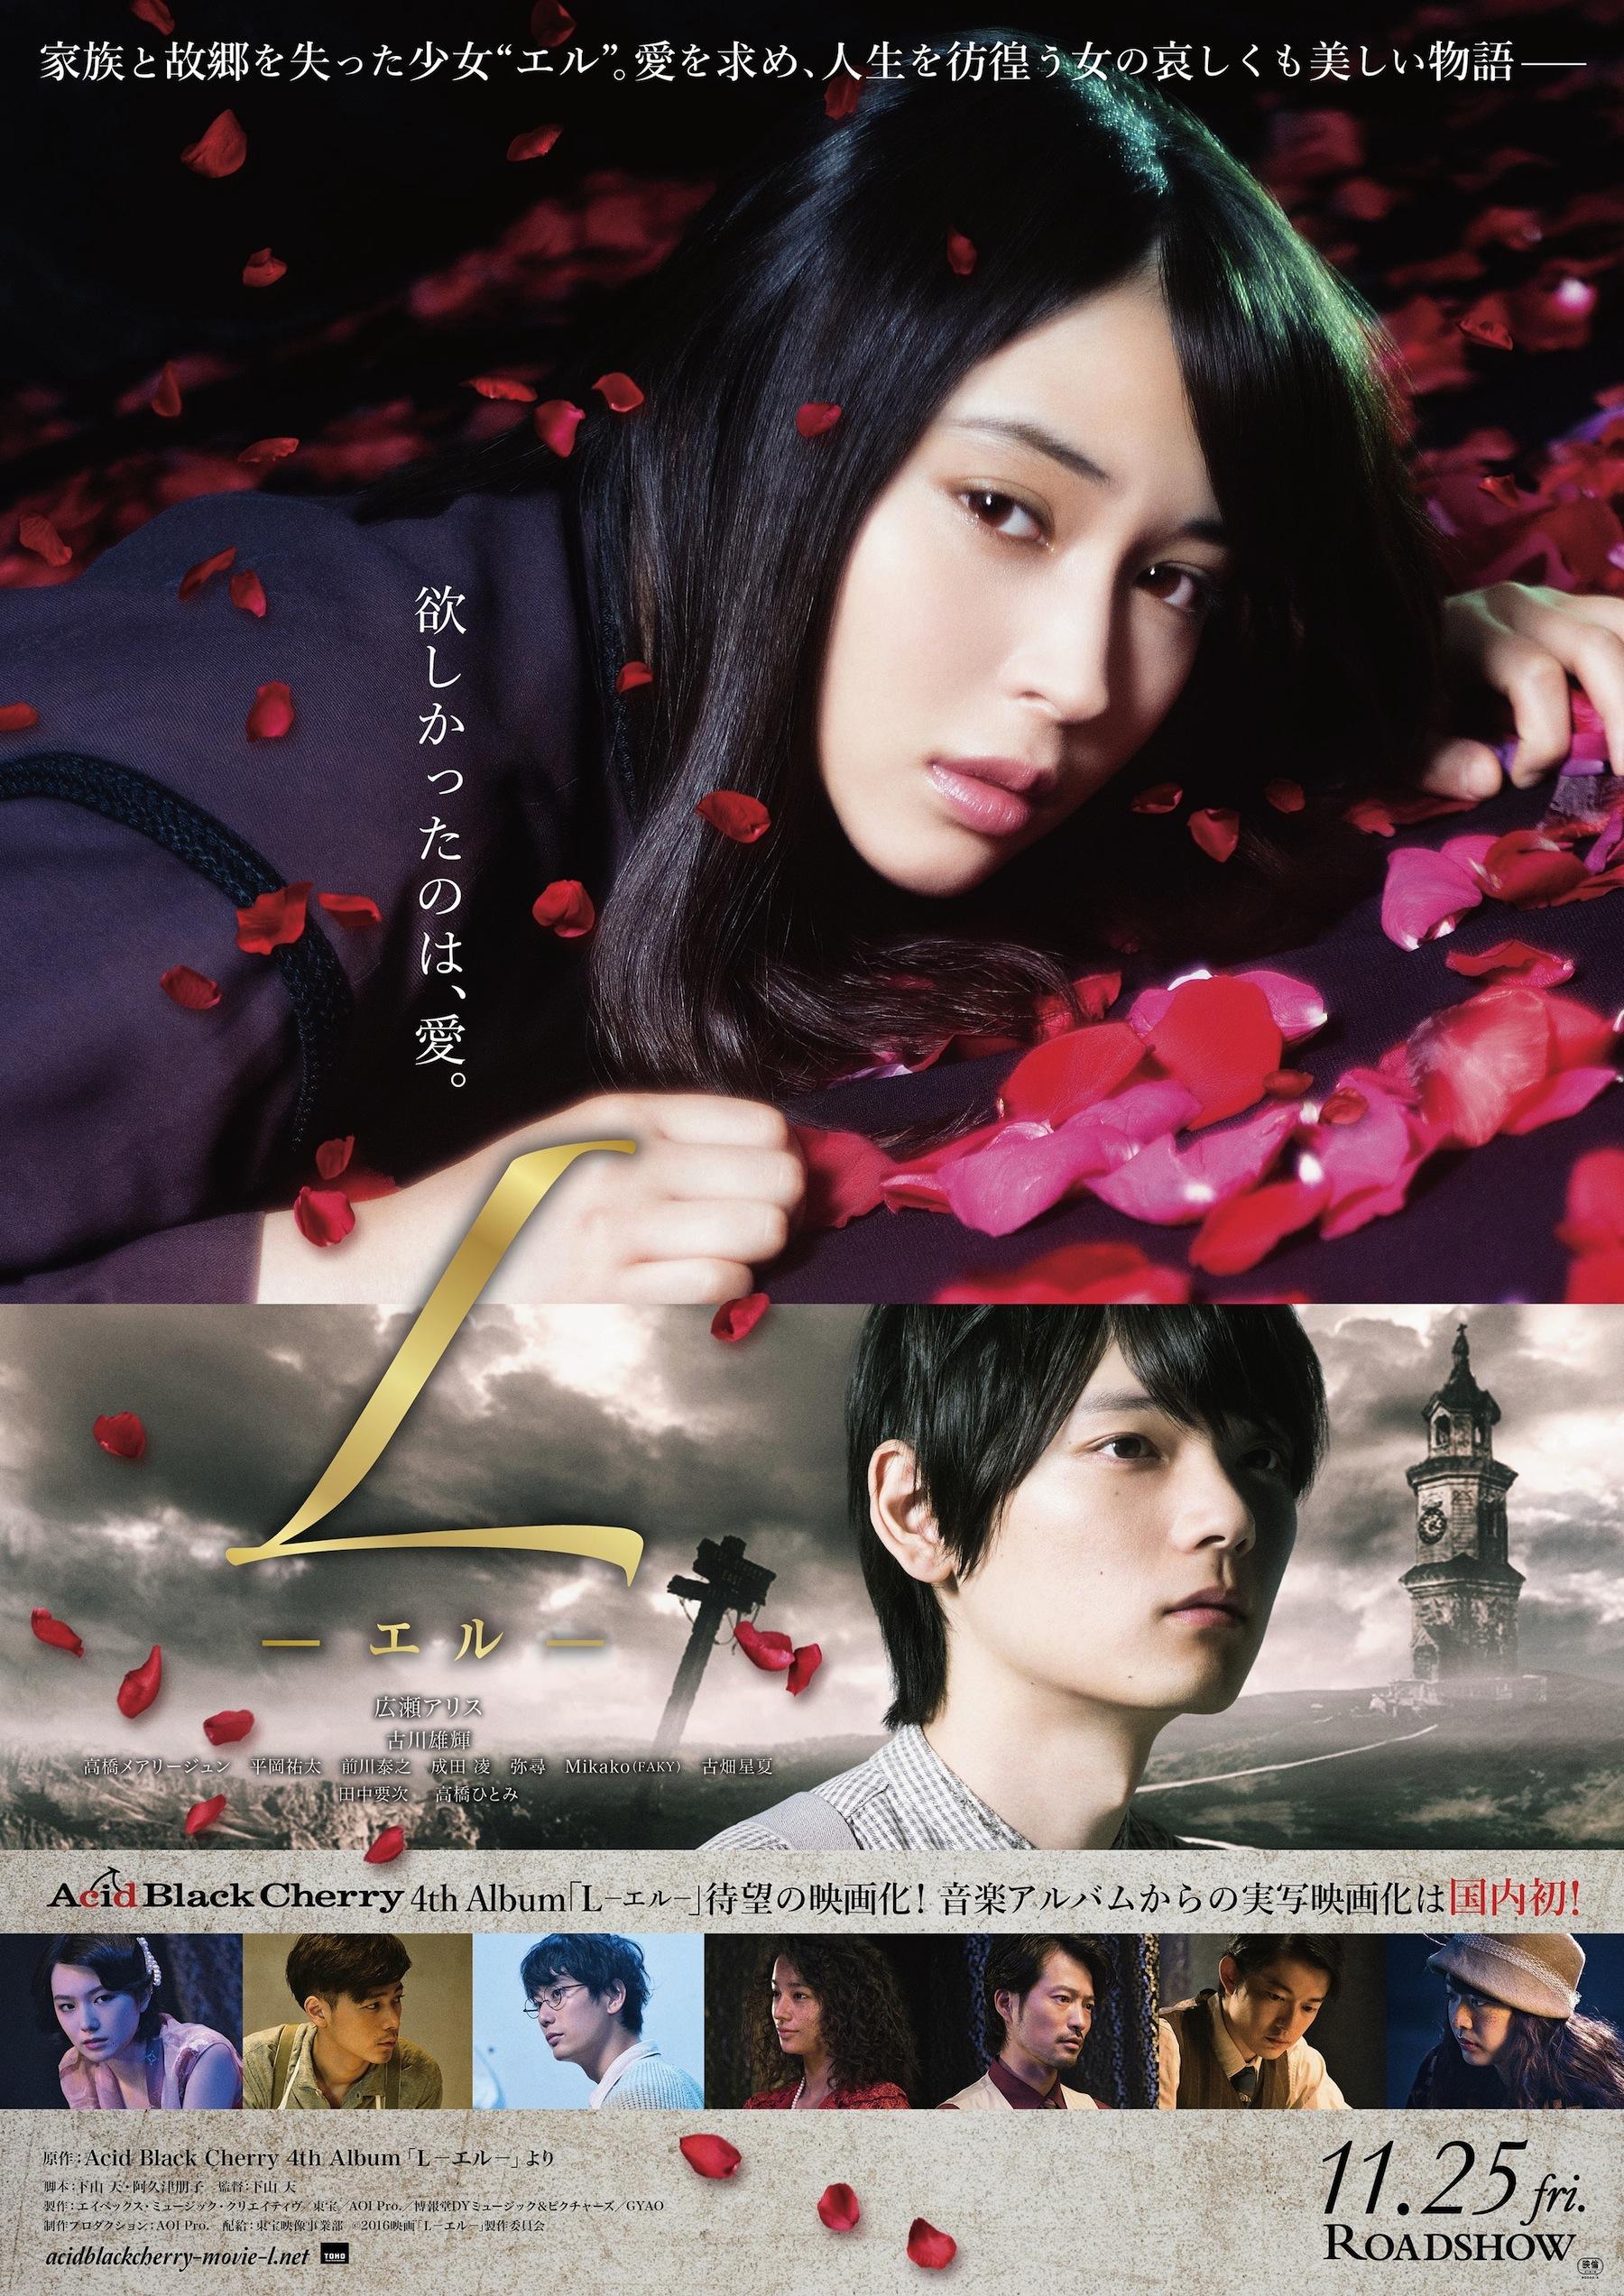 (C)2016映画「L-エル-」製作委員会